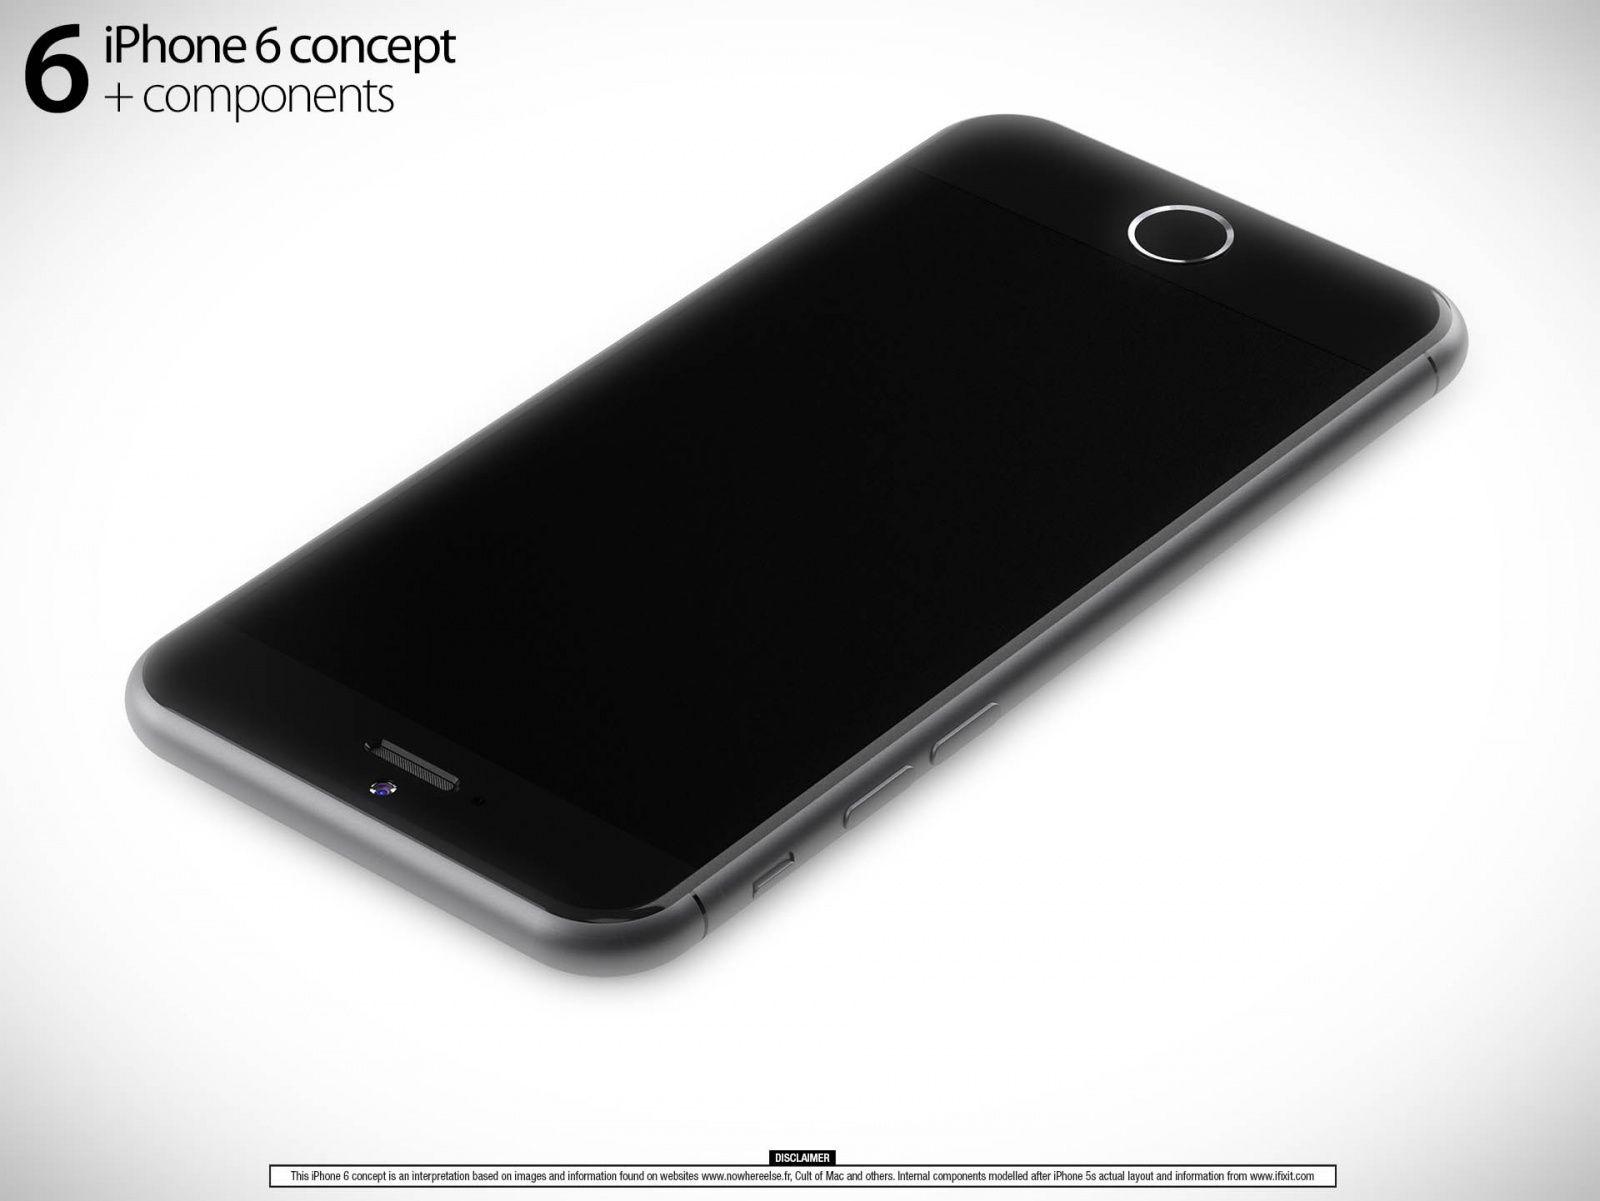 iphone6_martinhajek_13.jpgab0a5271-8cdd-4c74-bbe0-cc0bb07029abOriginal